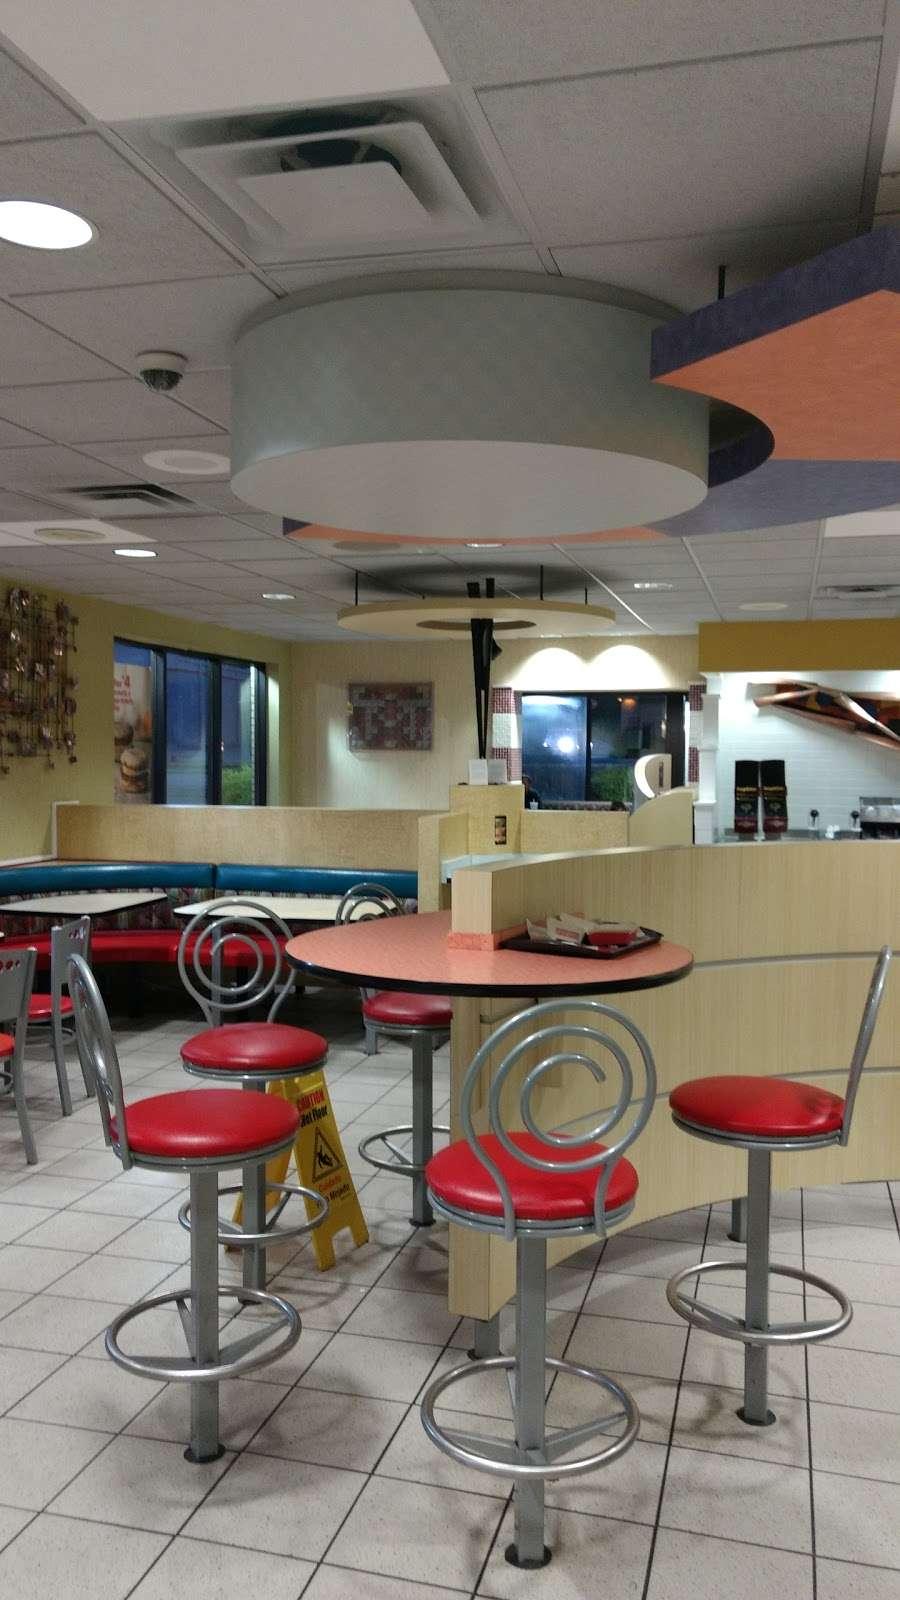 McDonalds - cafe  | Photo 3 of 10 | Address: 1187 Texas Palmyra Hwy, Honesdale, PA 18431, USA | Phone: (570) 253-5512